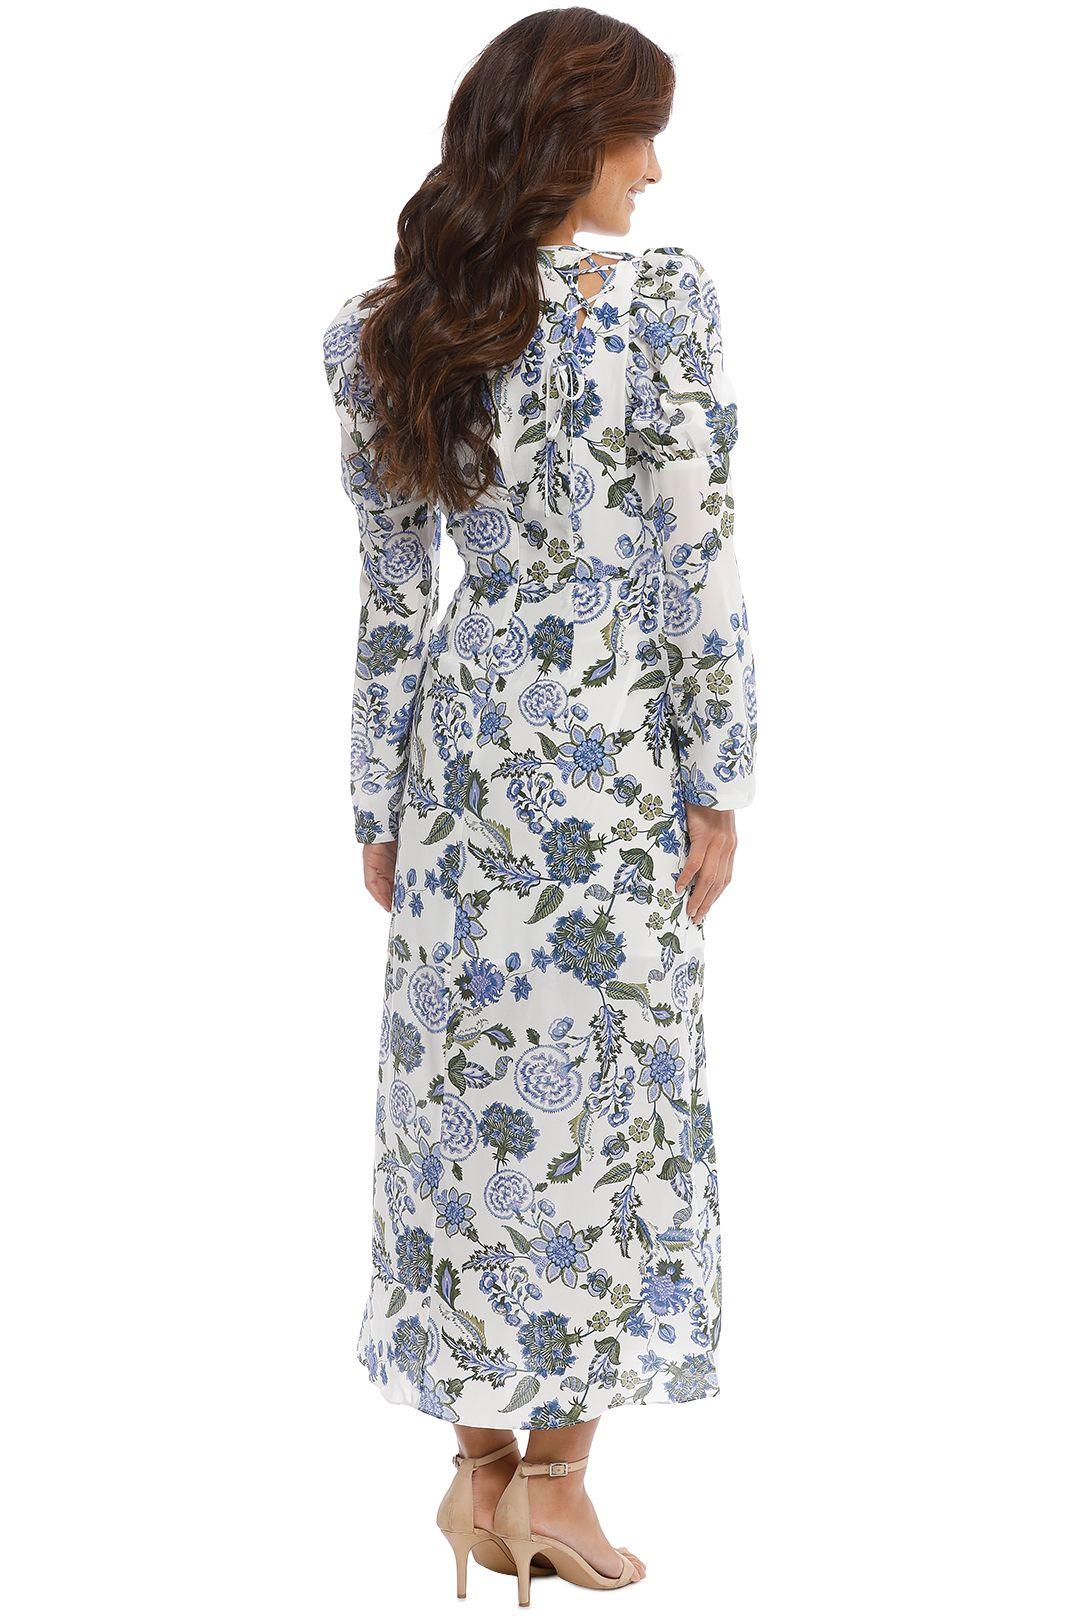 Thurley - Valentina Dress - Cornflower - Back